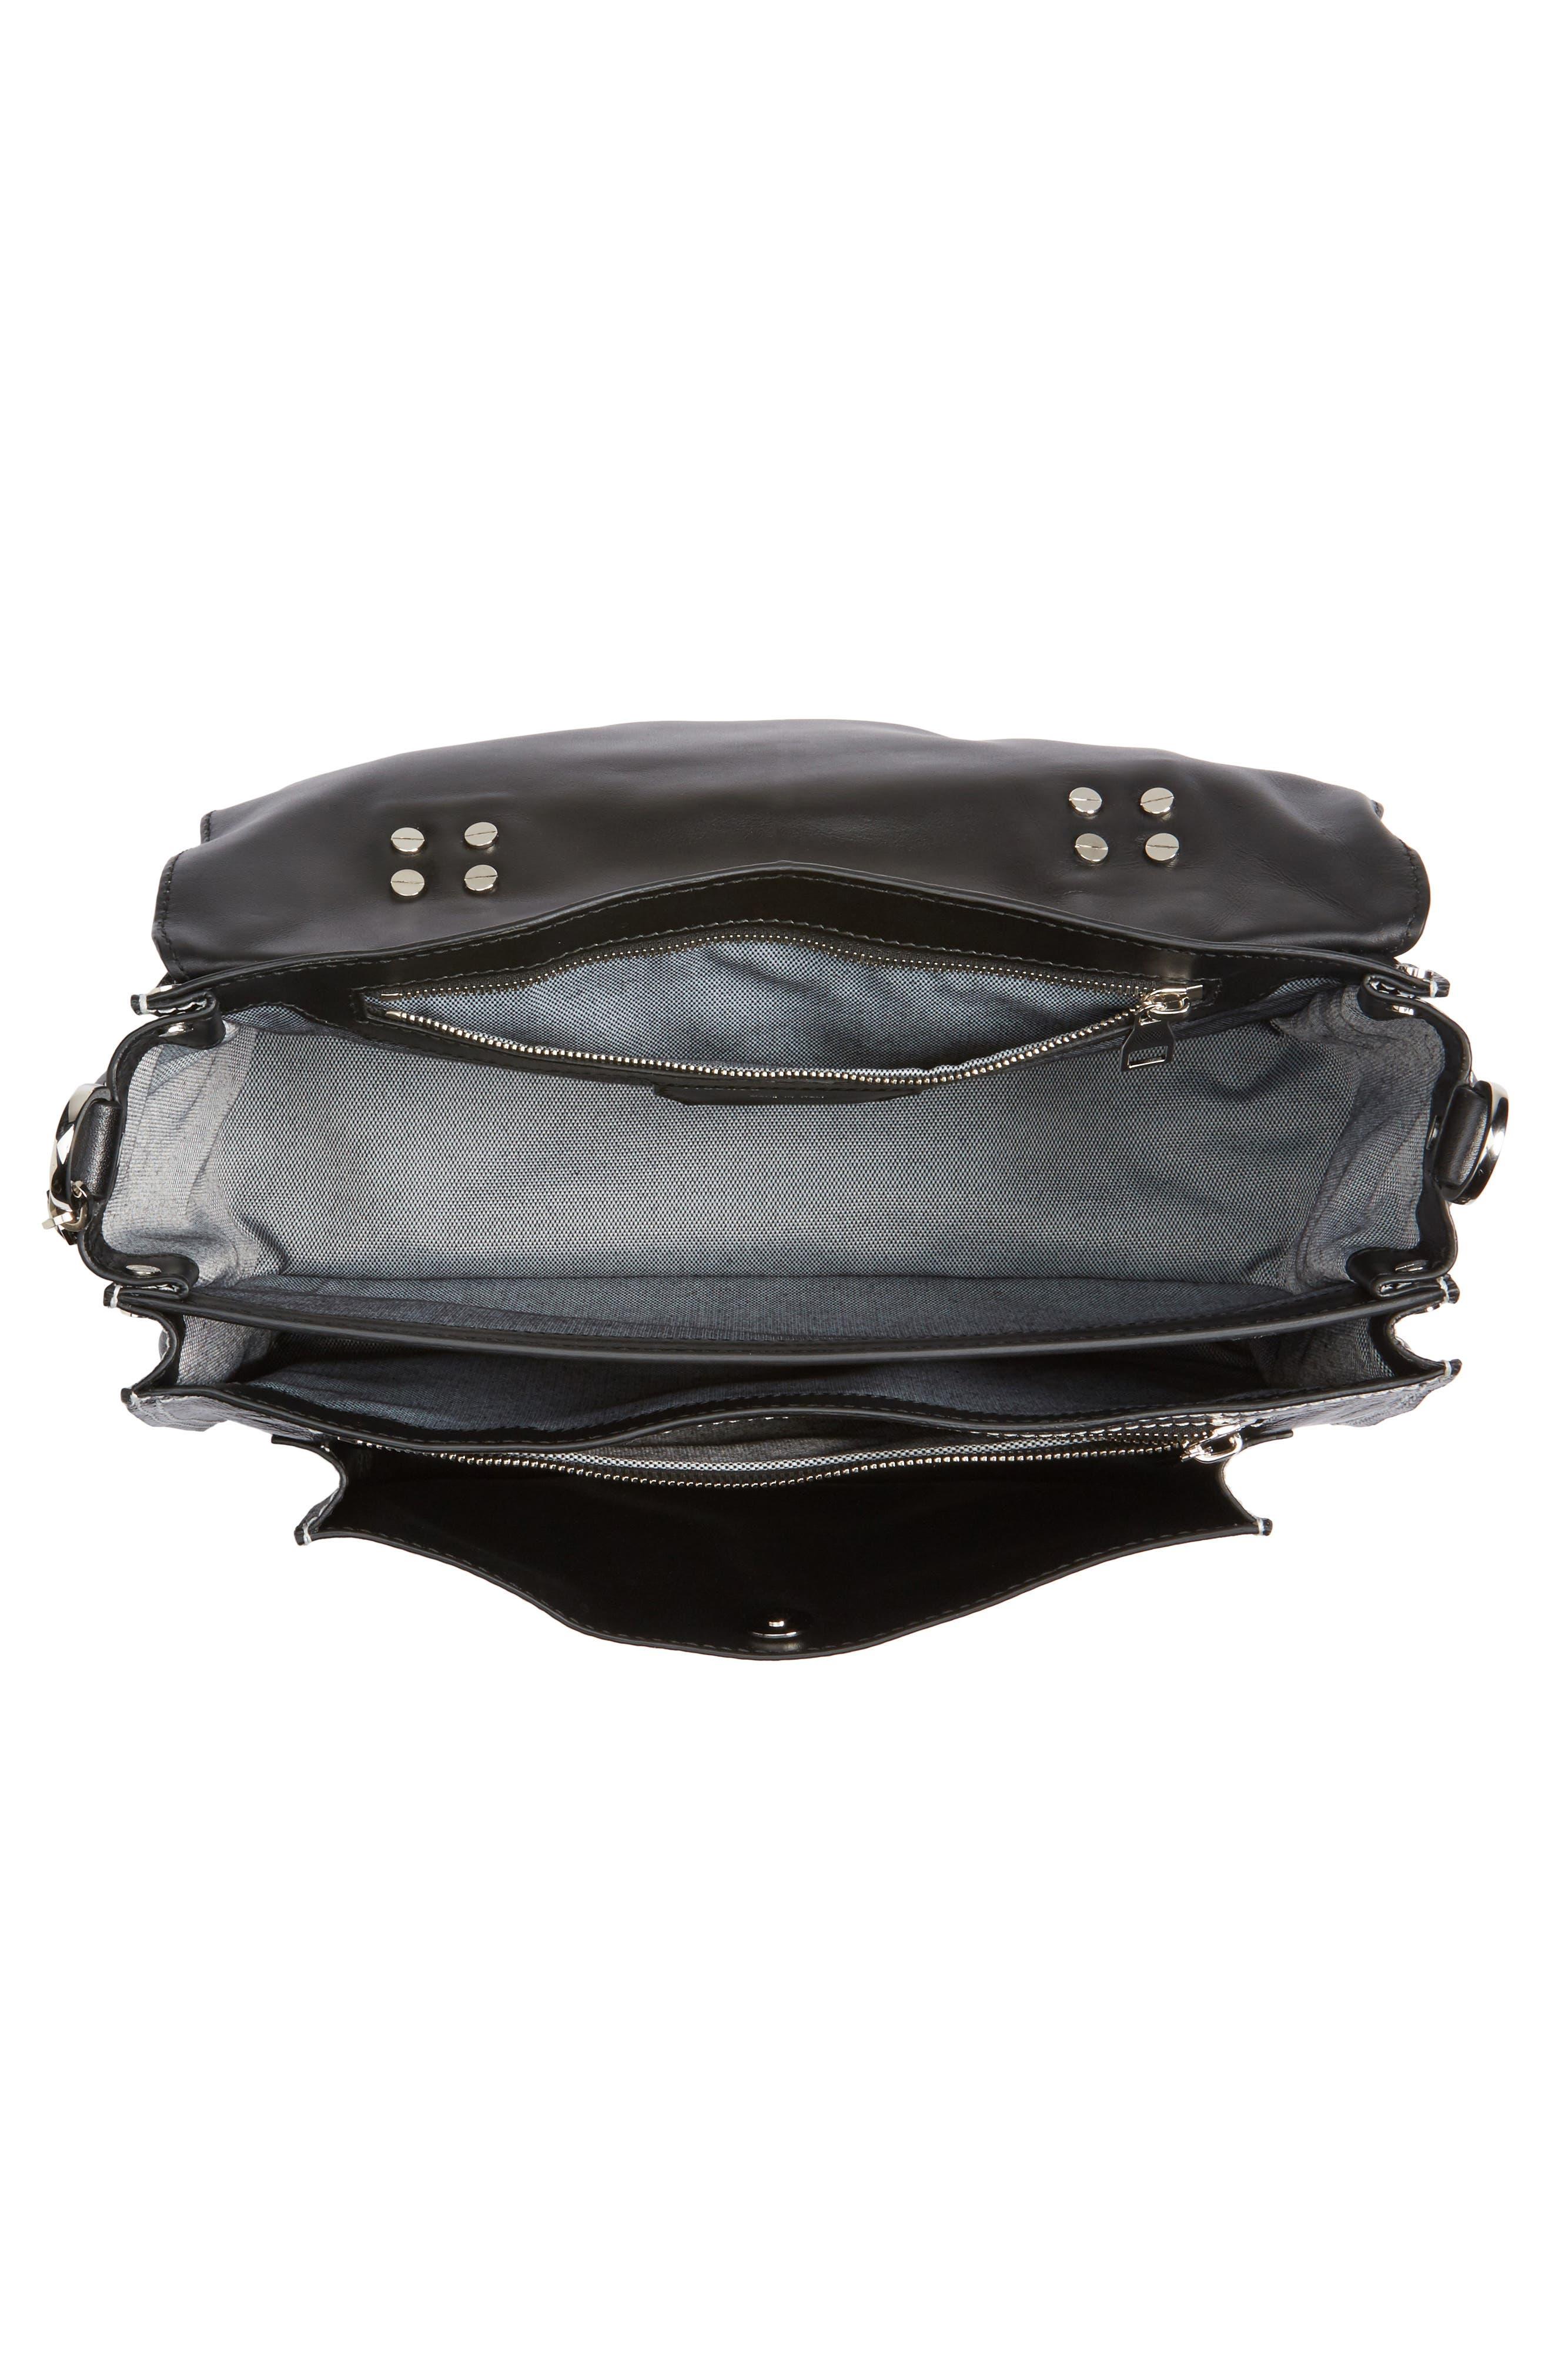 Alternate Image 3  - Proenza Schouler Medium PS1 Calfskin Leather Satchel